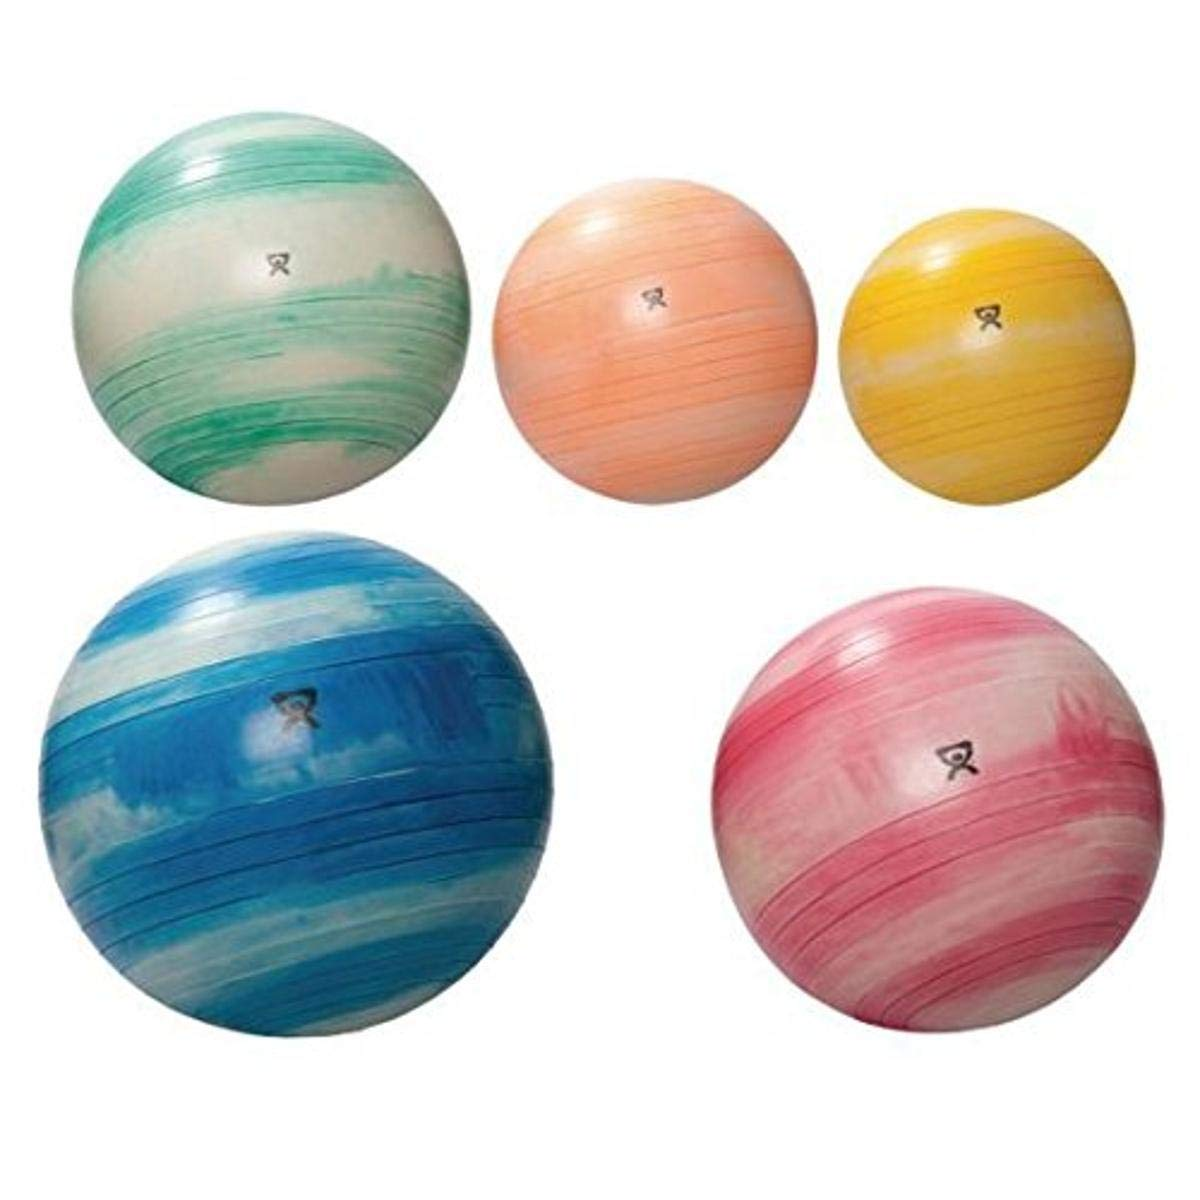 Cando Burst Resistant Exercise Ball